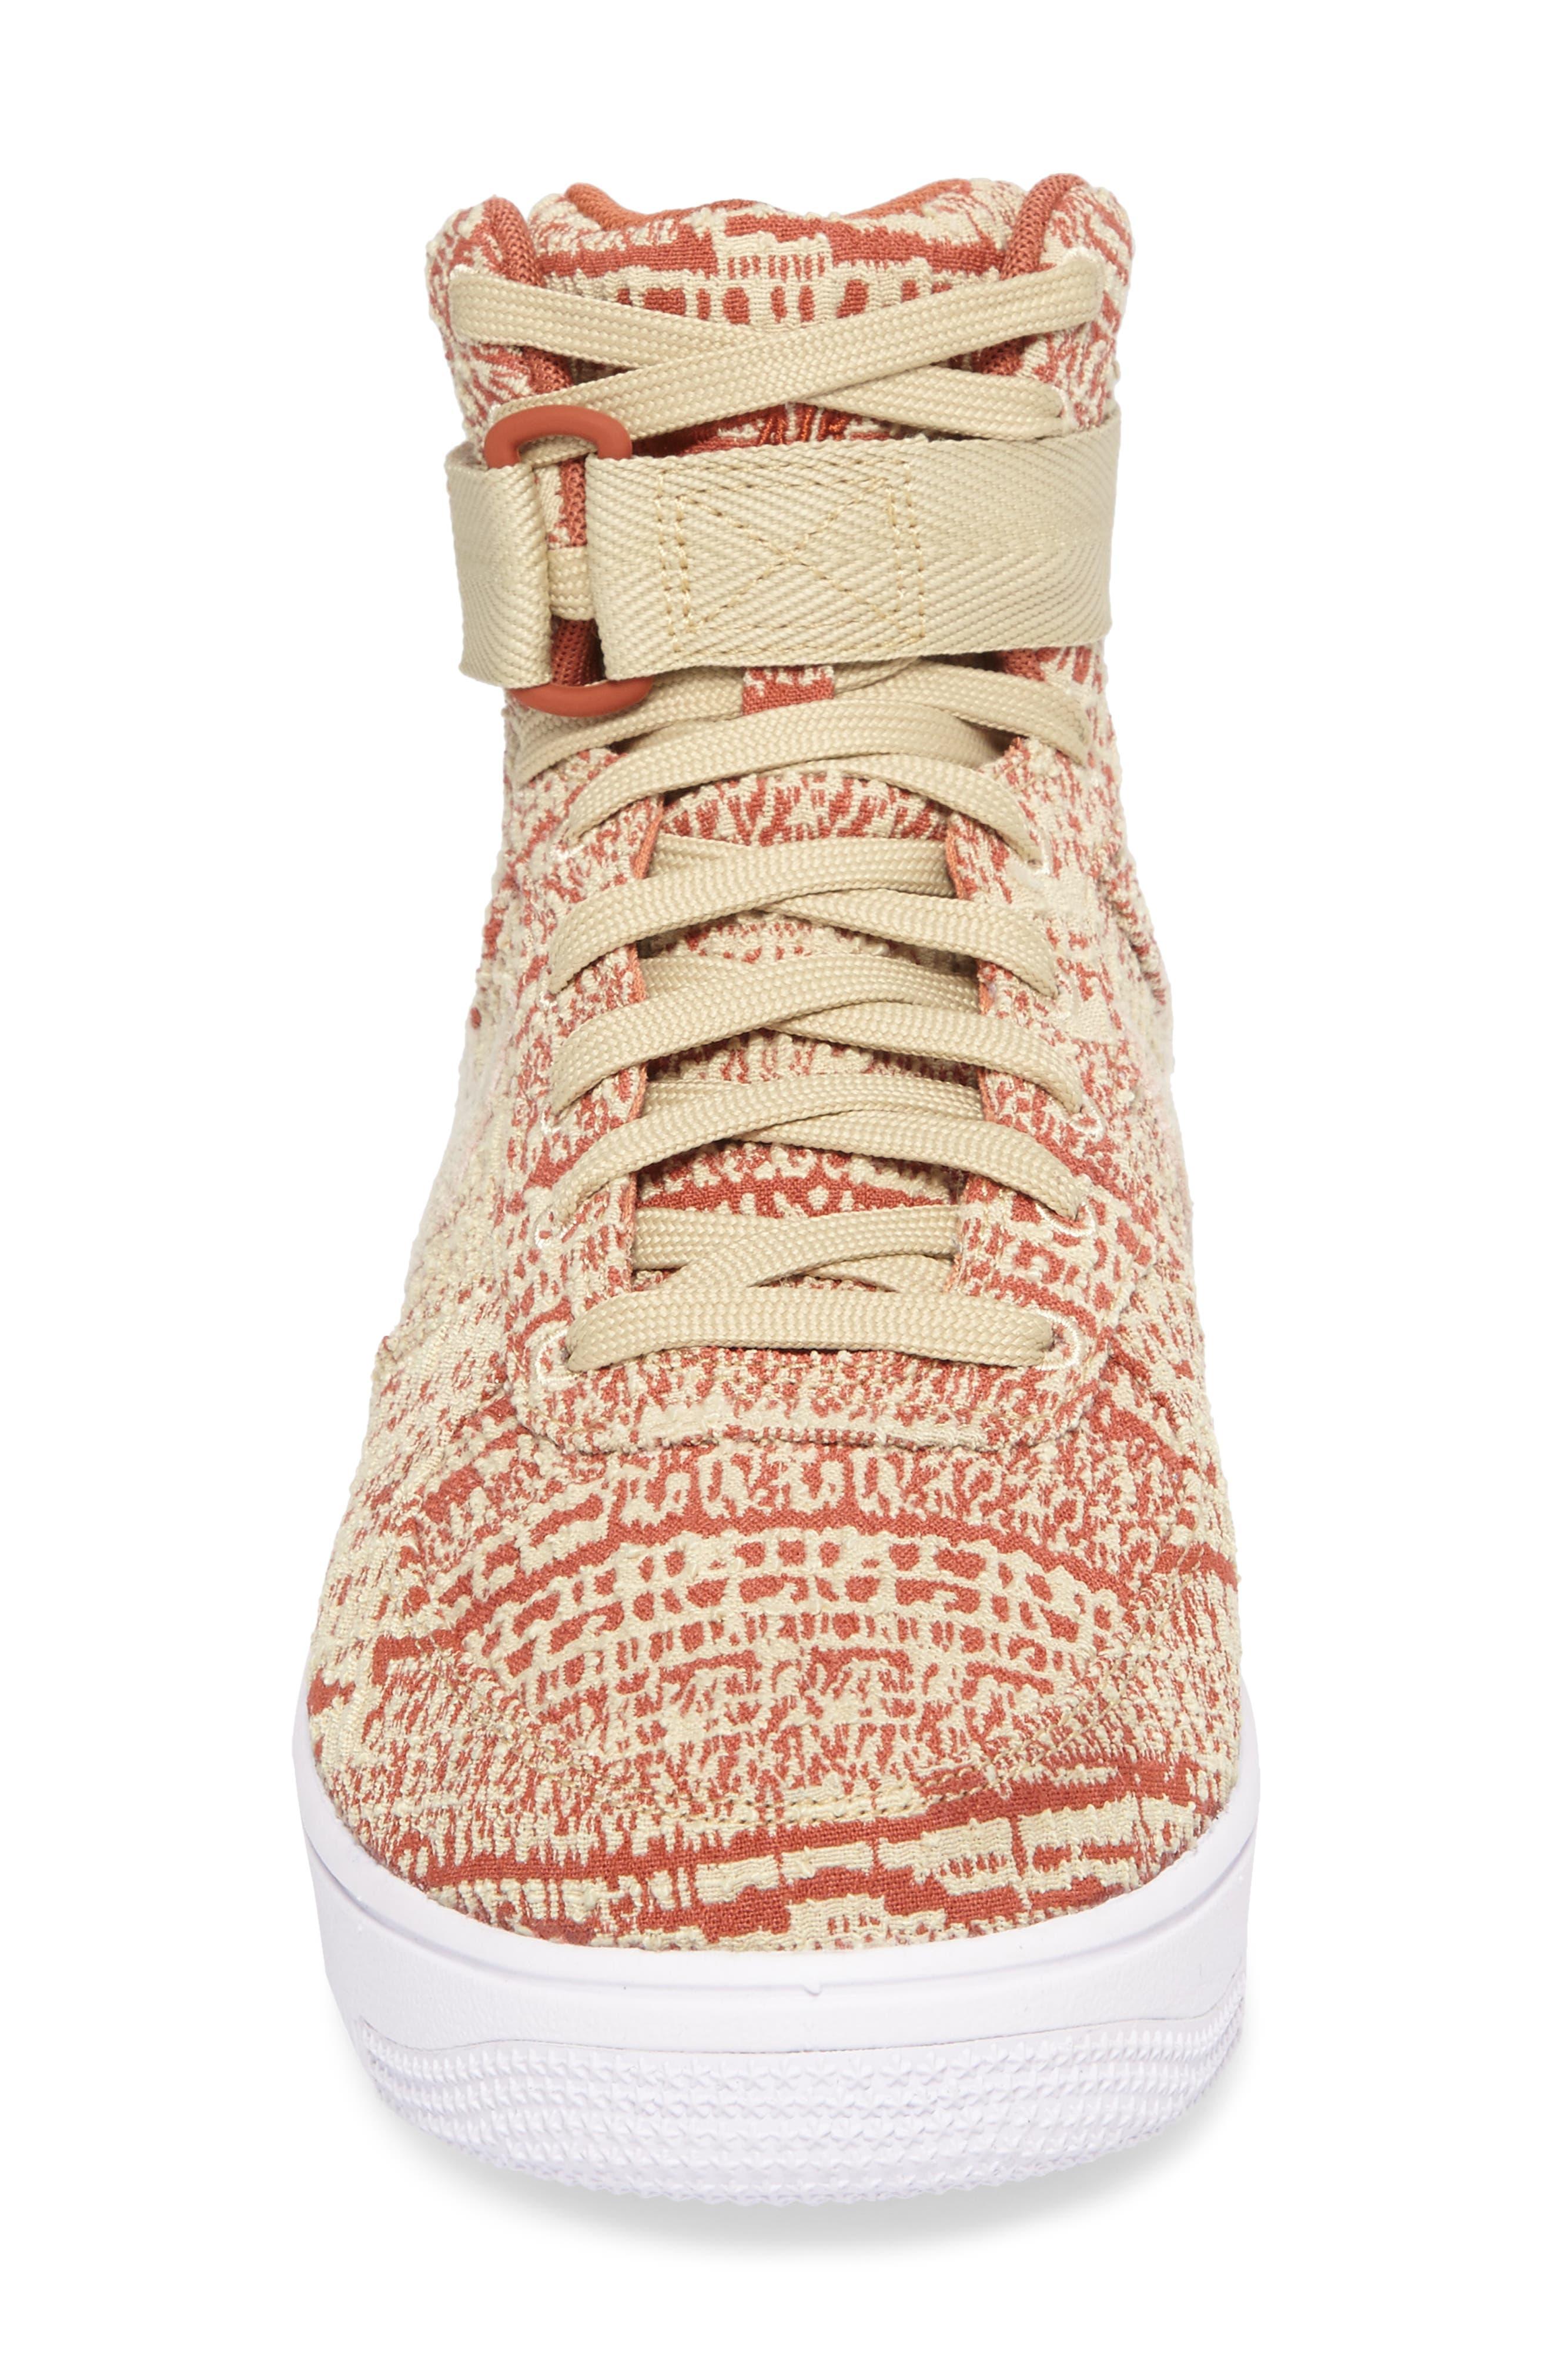 Air Force 1 Ultraforce Hi Sneaker,                             Alternate thumbnail 4, color,                             Team Gold/Dusty Peach/White